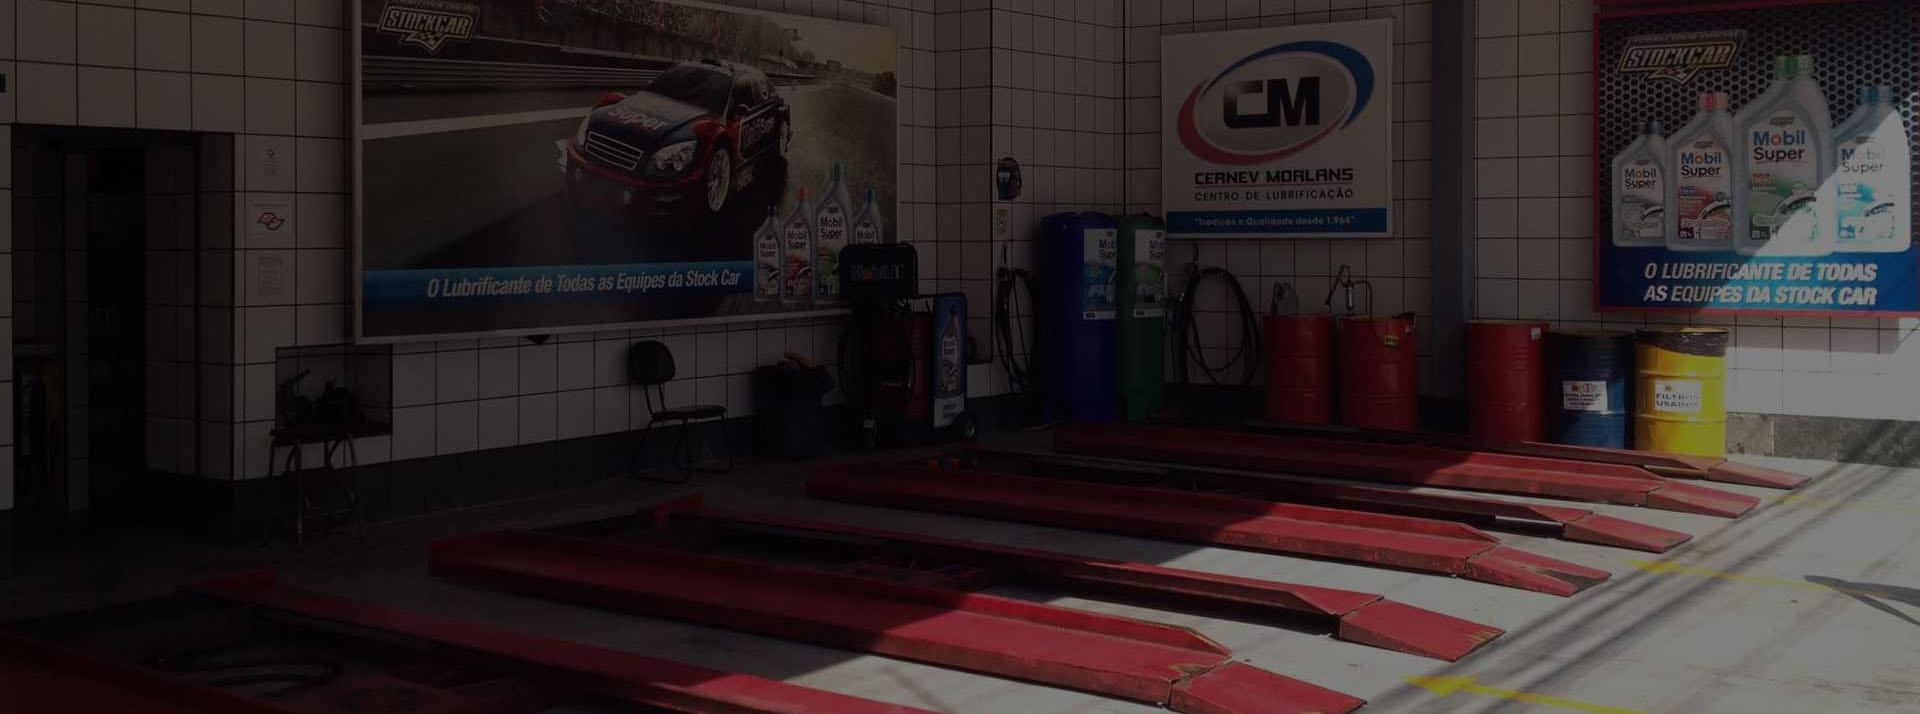 cernevmorlans-oleo-compressor-automotivo-para-toyota